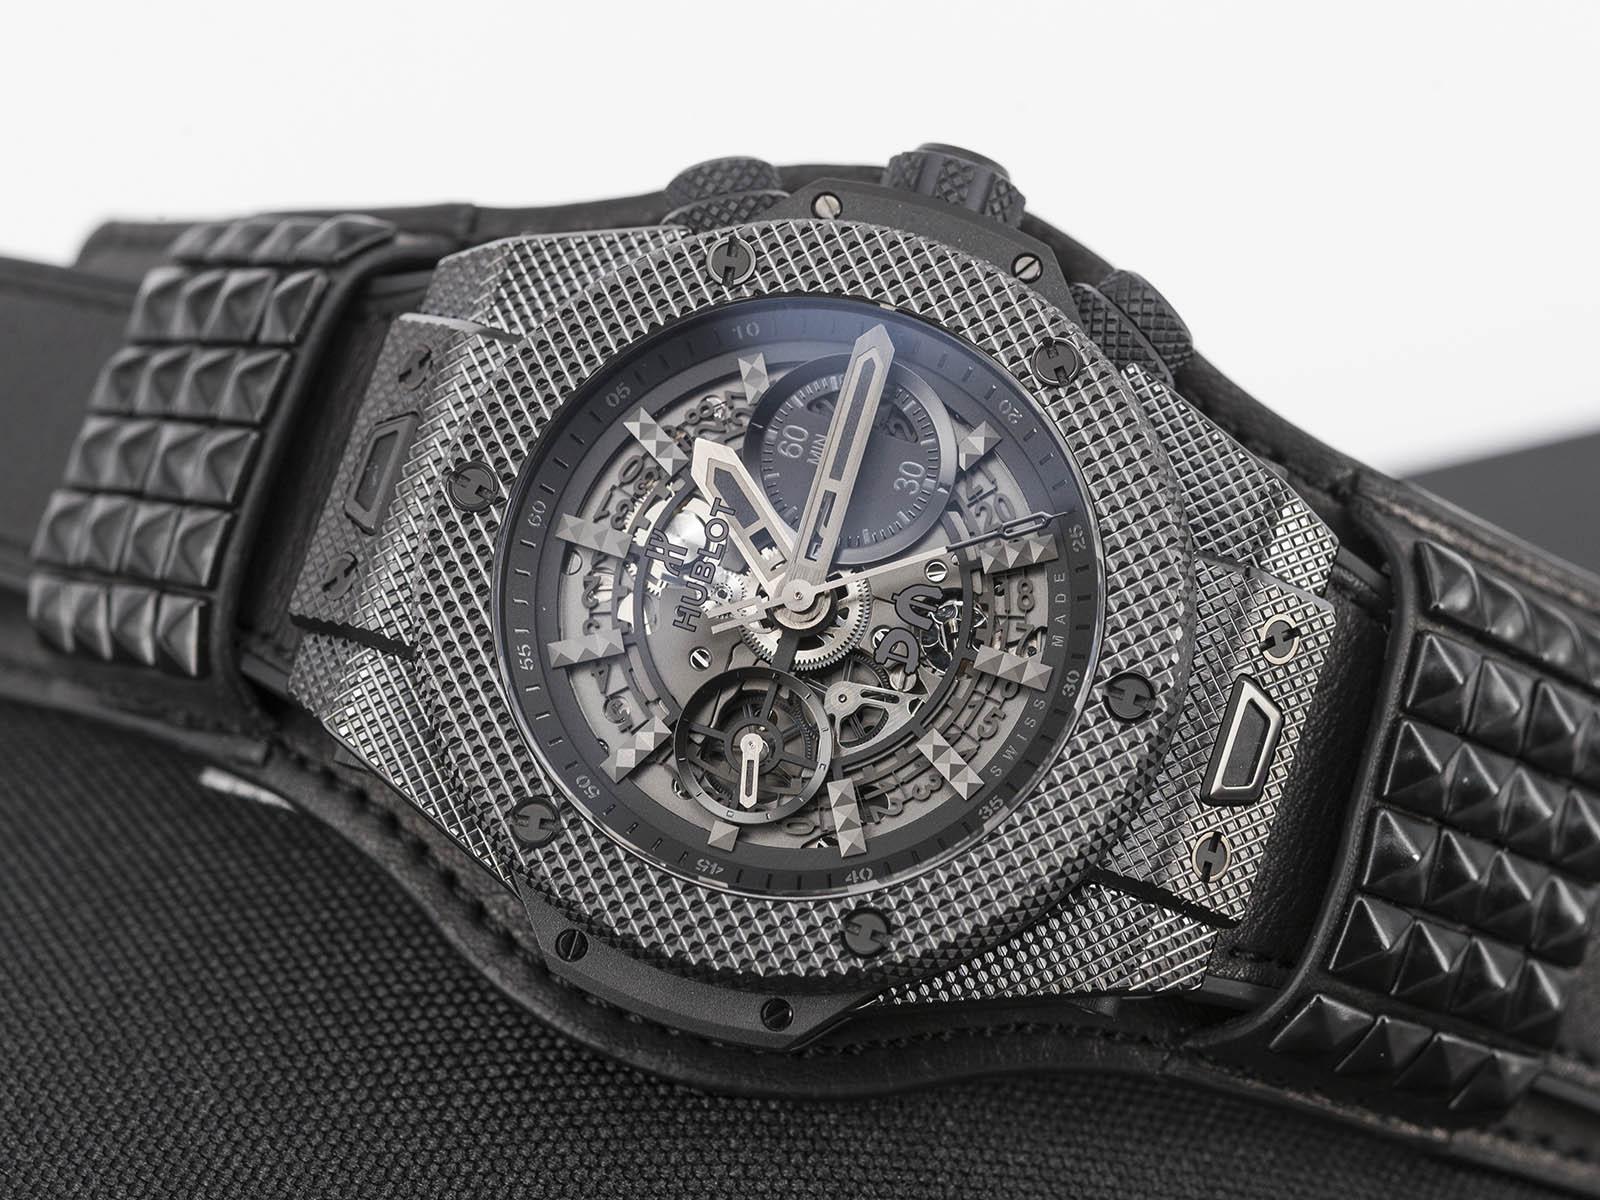 Ref.: novosti-rossiya.ru купить ♂ мужские часы копию hublot depeche mode all black big bang за 6 руб.